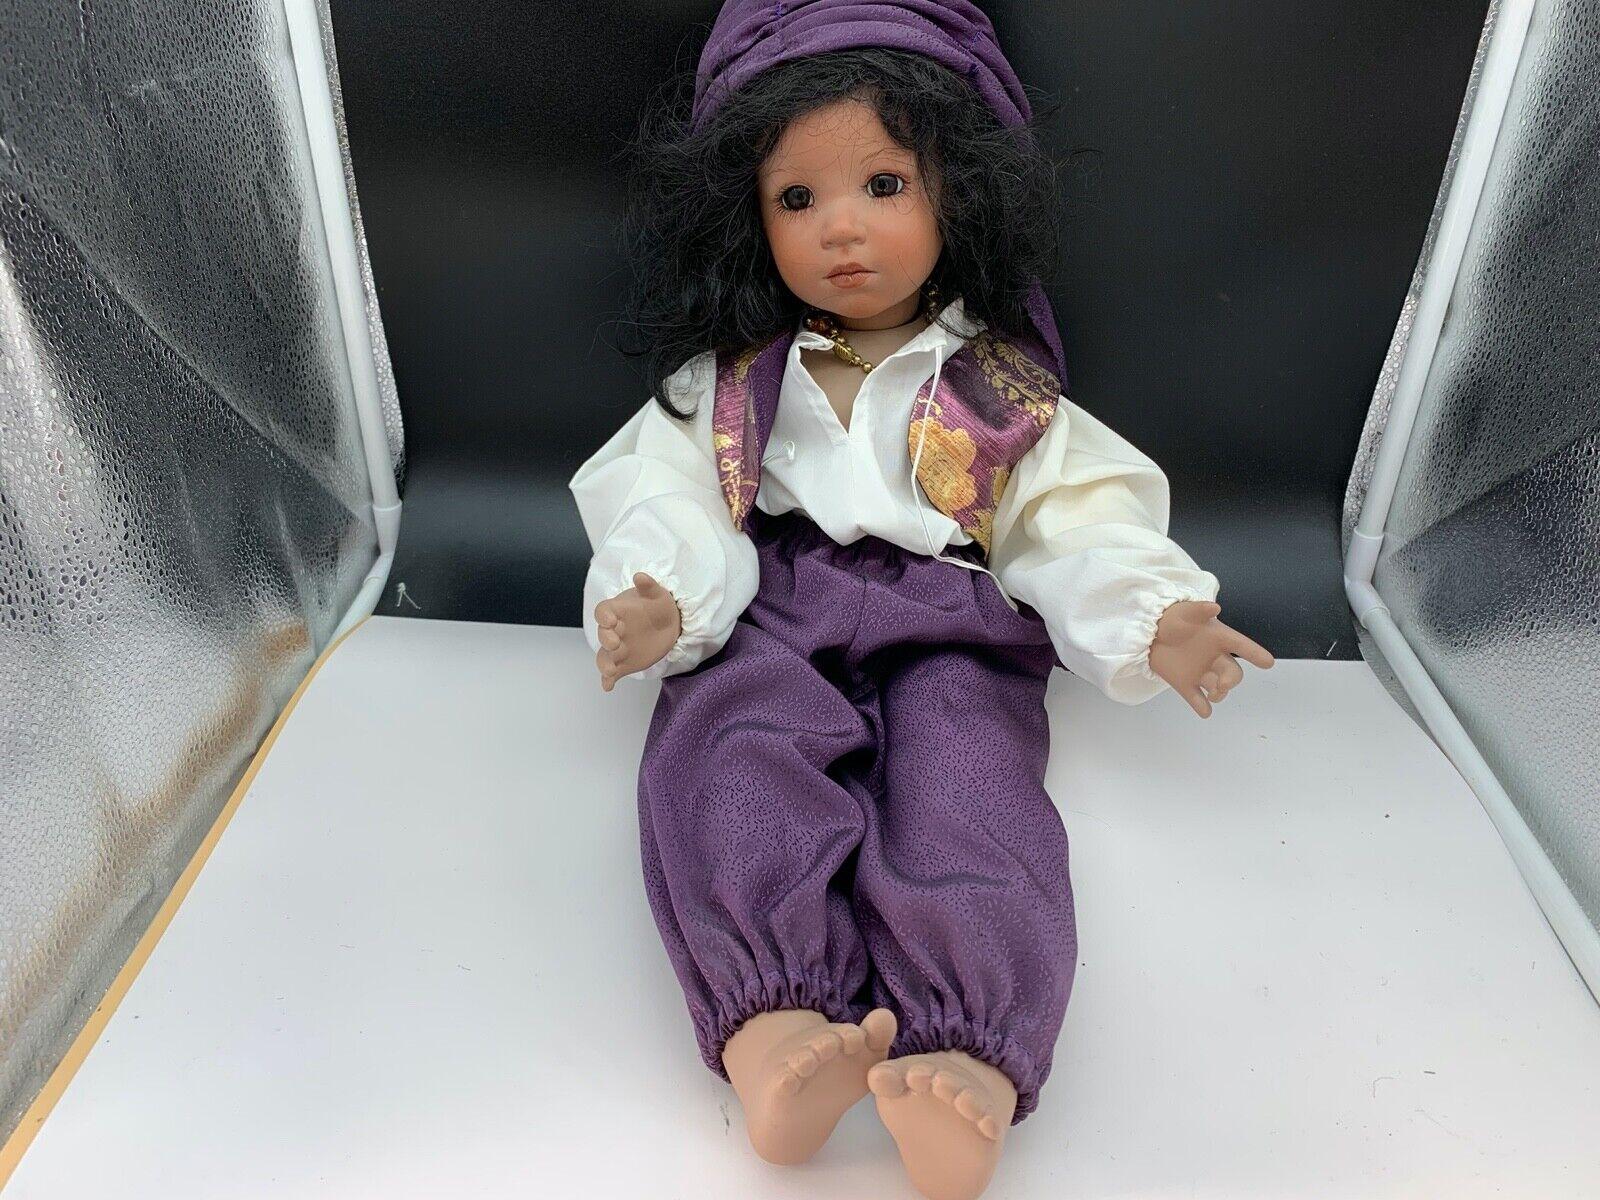 Künstlerpuppe Porzellan Puppe 48 cm. Top Zustand